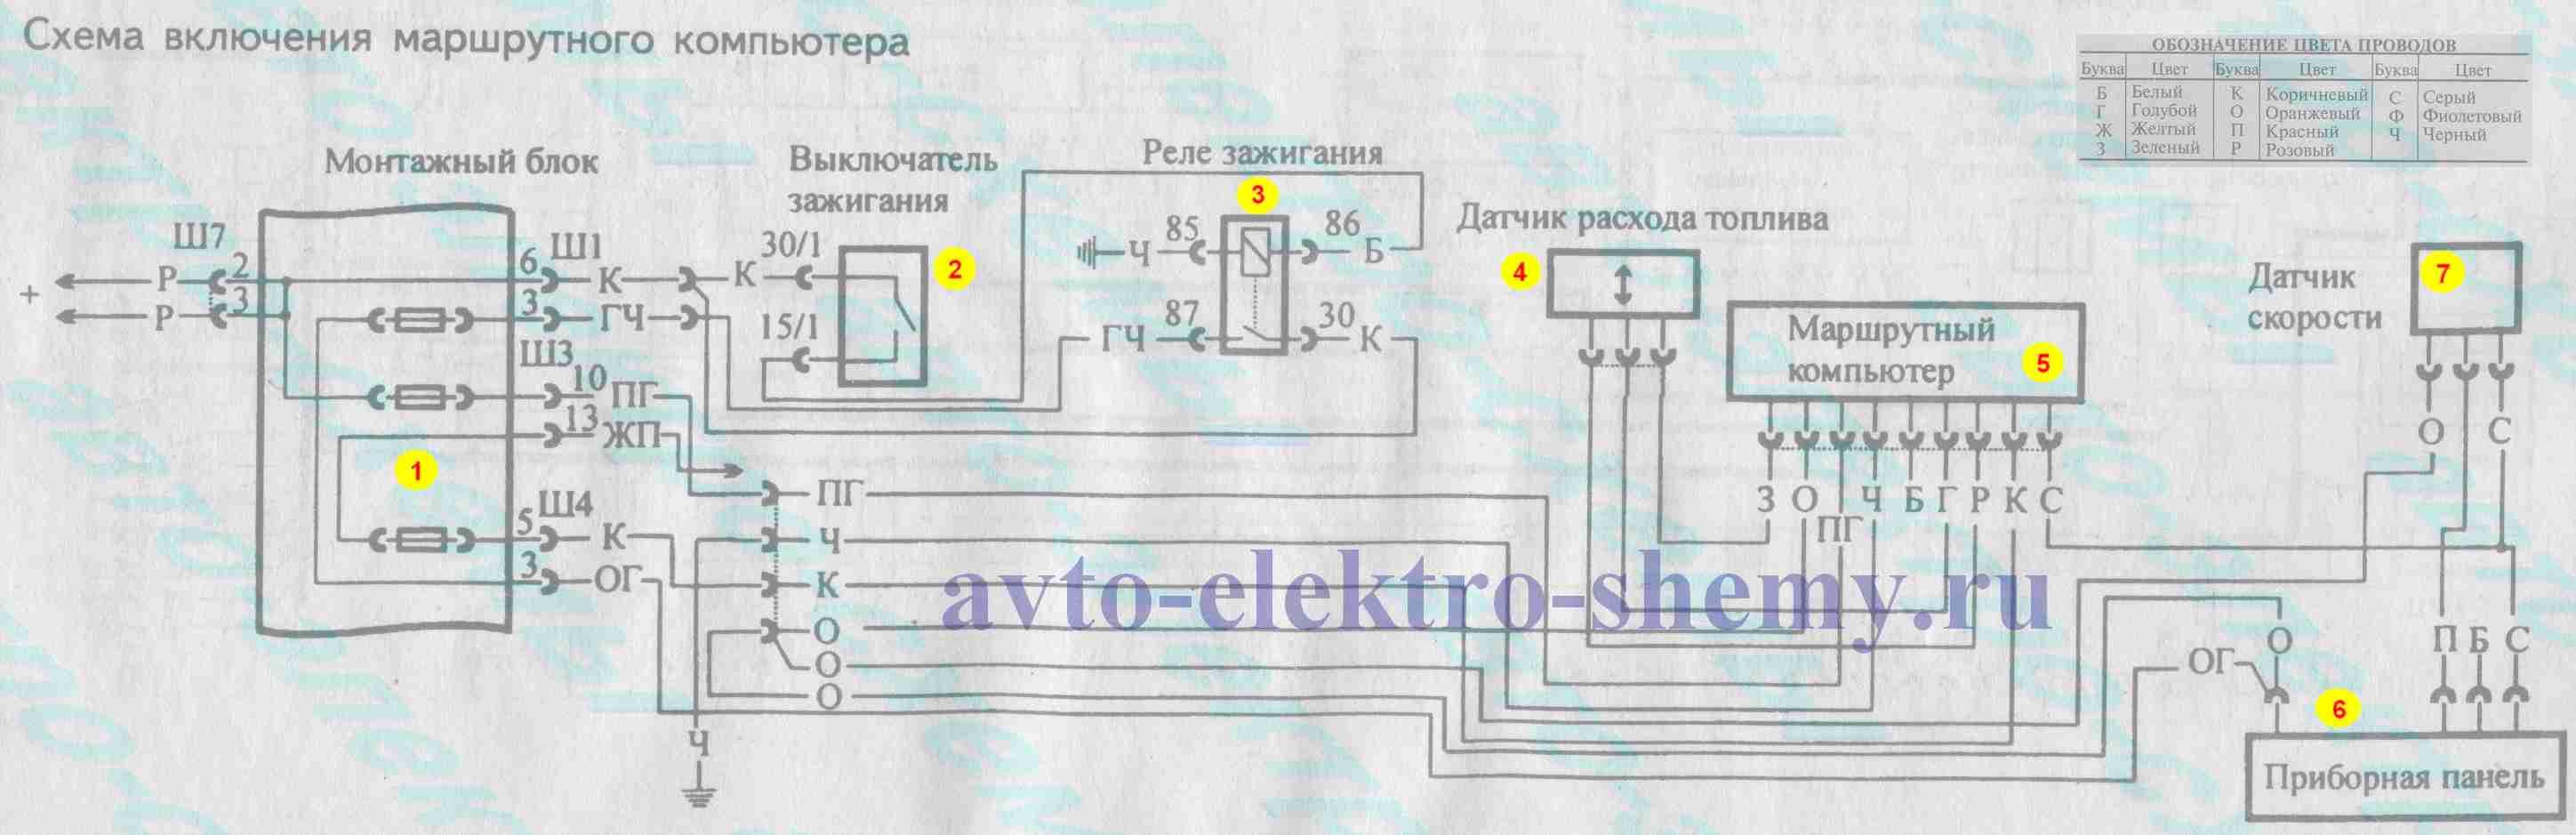 электра схема машины 99